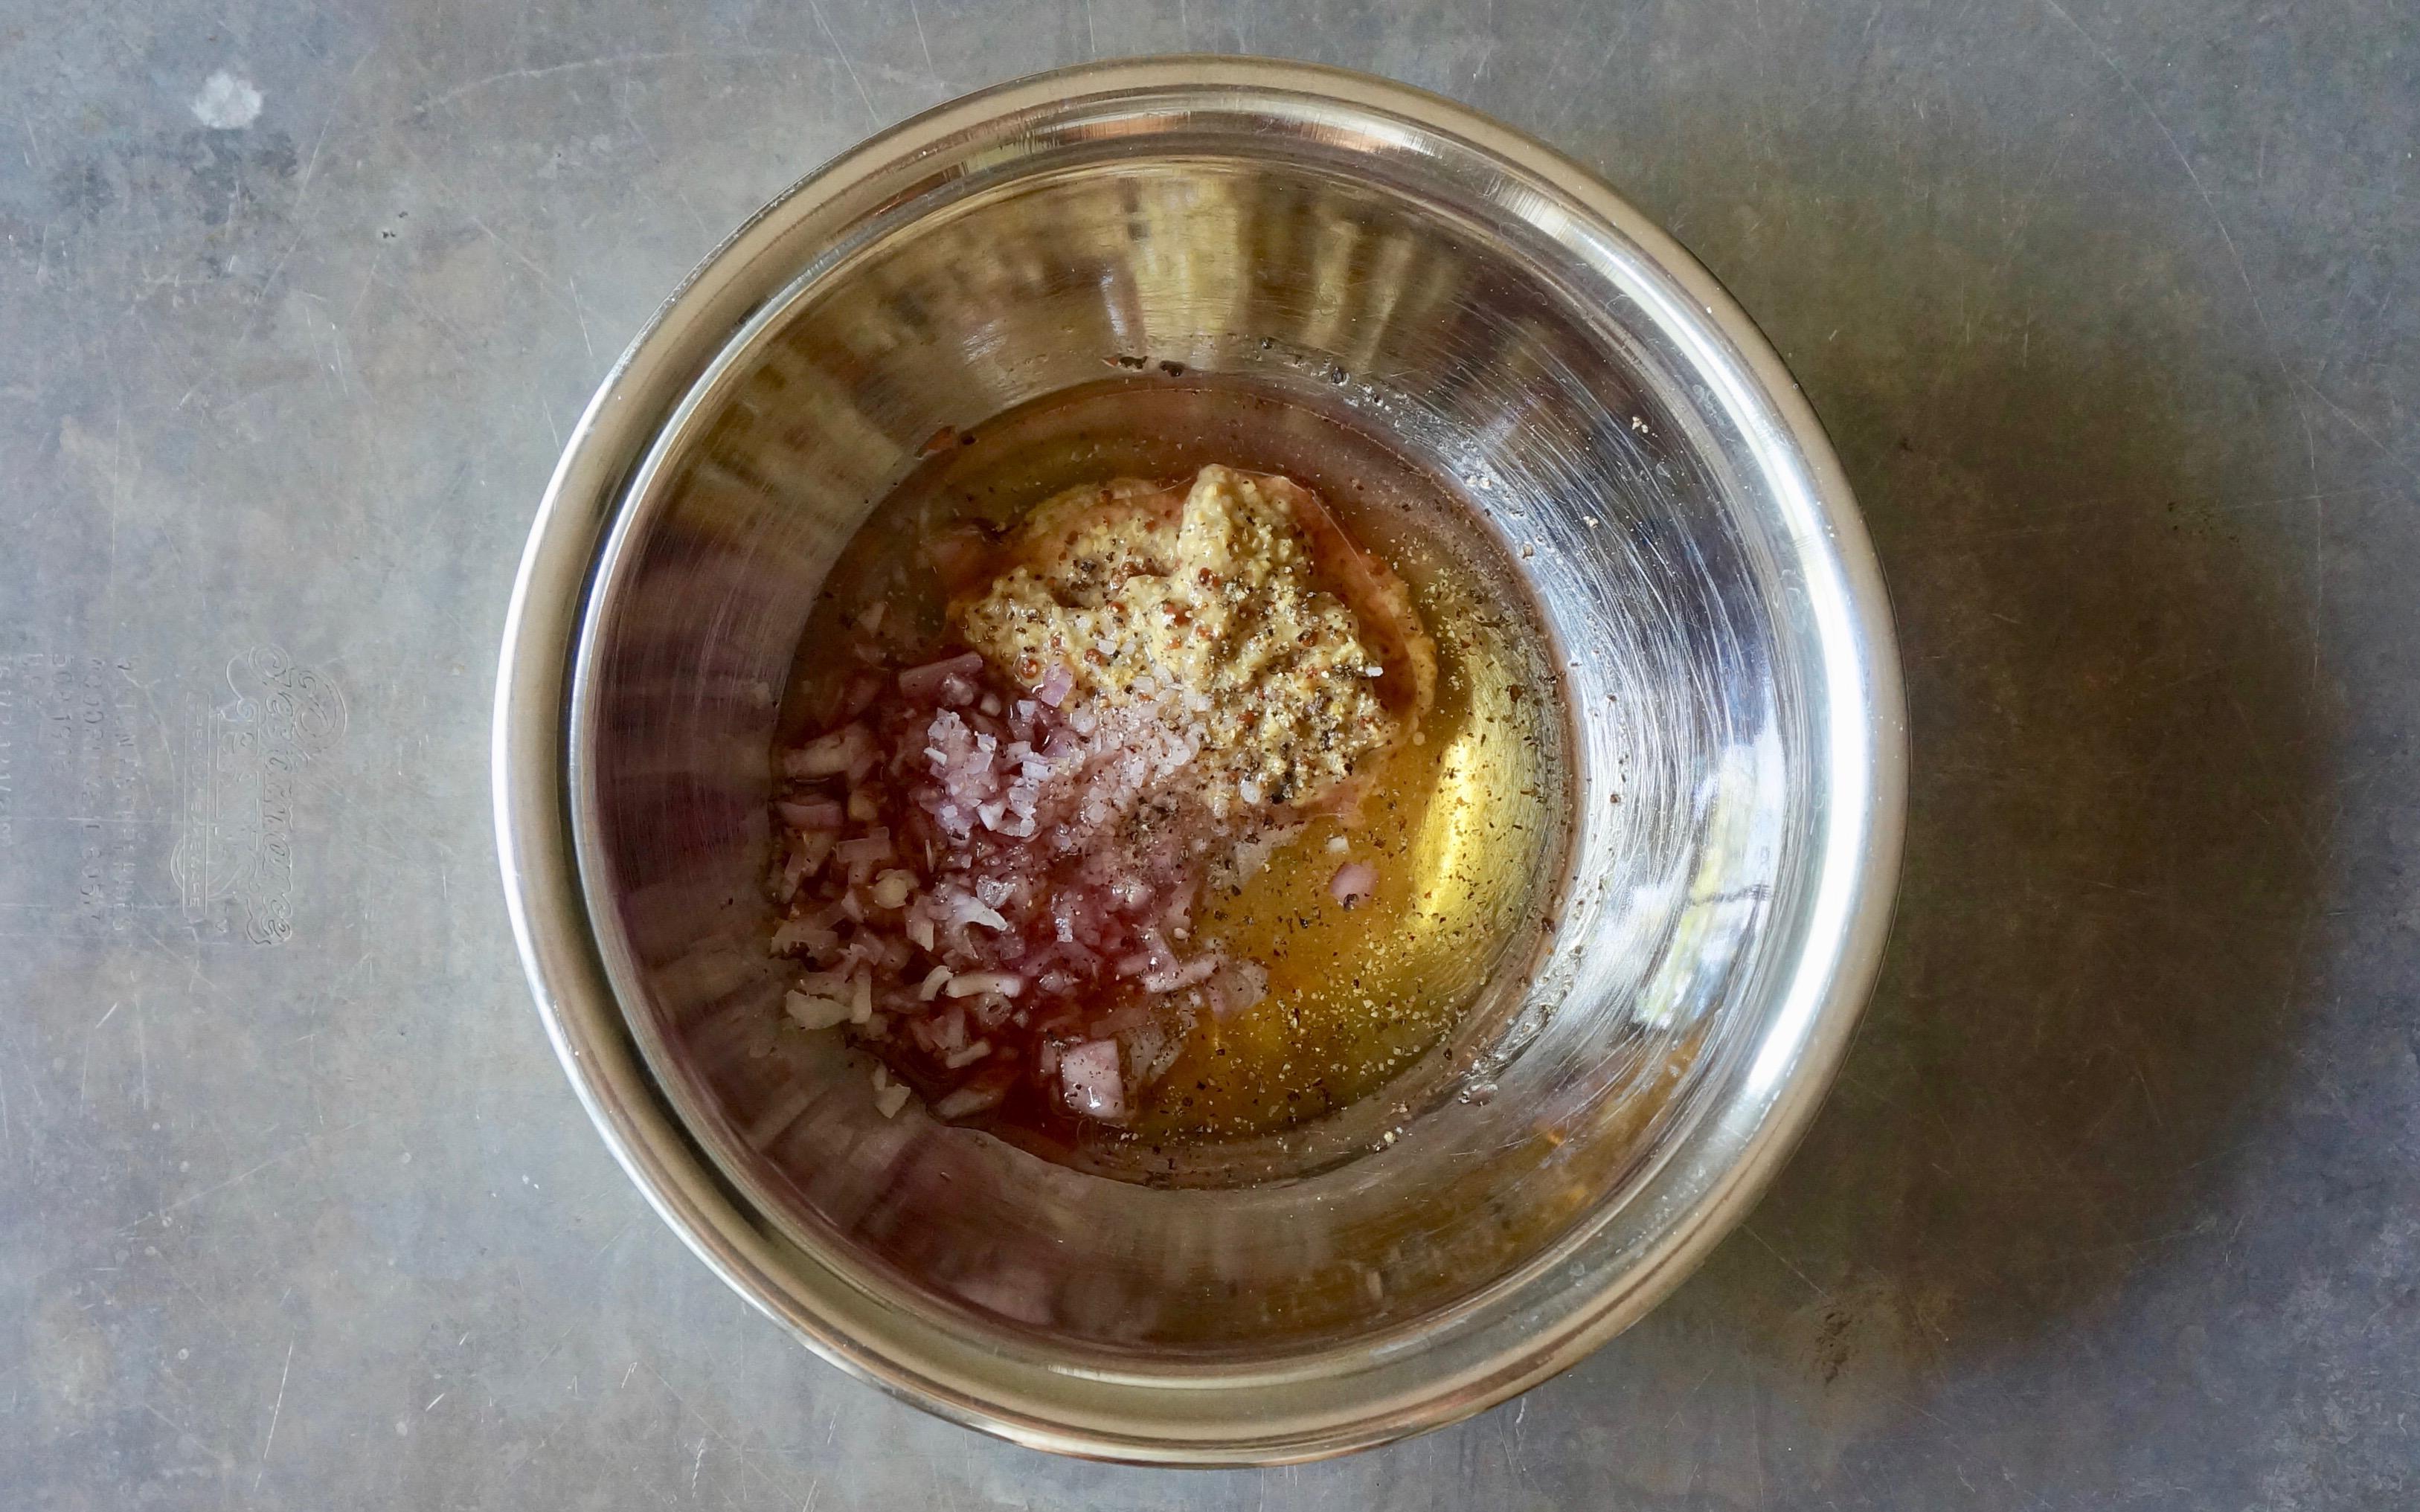 Stone-Ground-Mustard-Rebecca-Gordon-Publisher-Buttermilk-Lipstick-Culinary-Entertaining-Techniques-Southern-Hostess-RebeccaGordon-Pastry-Chef-Birmingham-Alabama